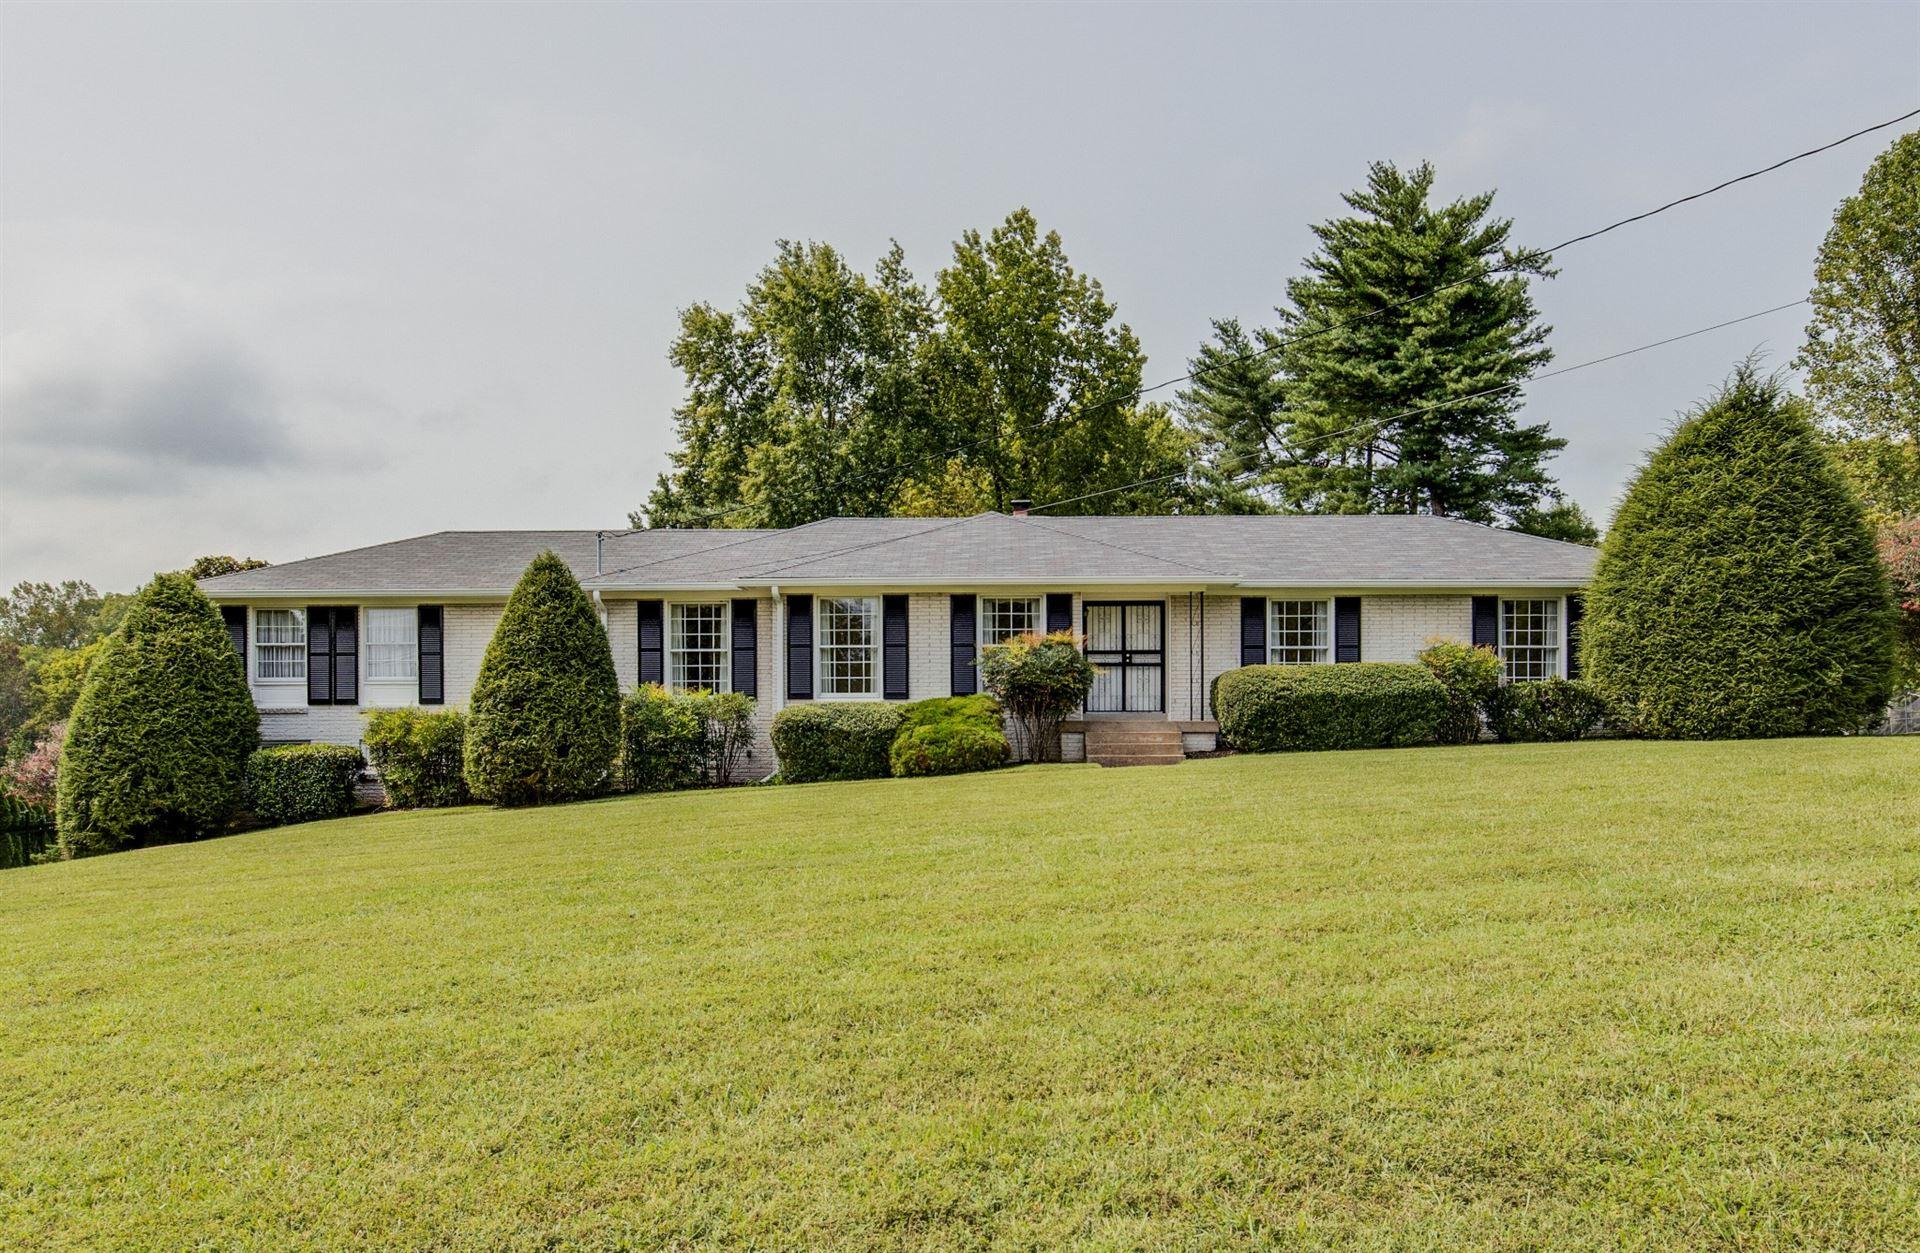 5310 Stallworth Dr, Nashville, TN 37220 - MLS#: 2189857